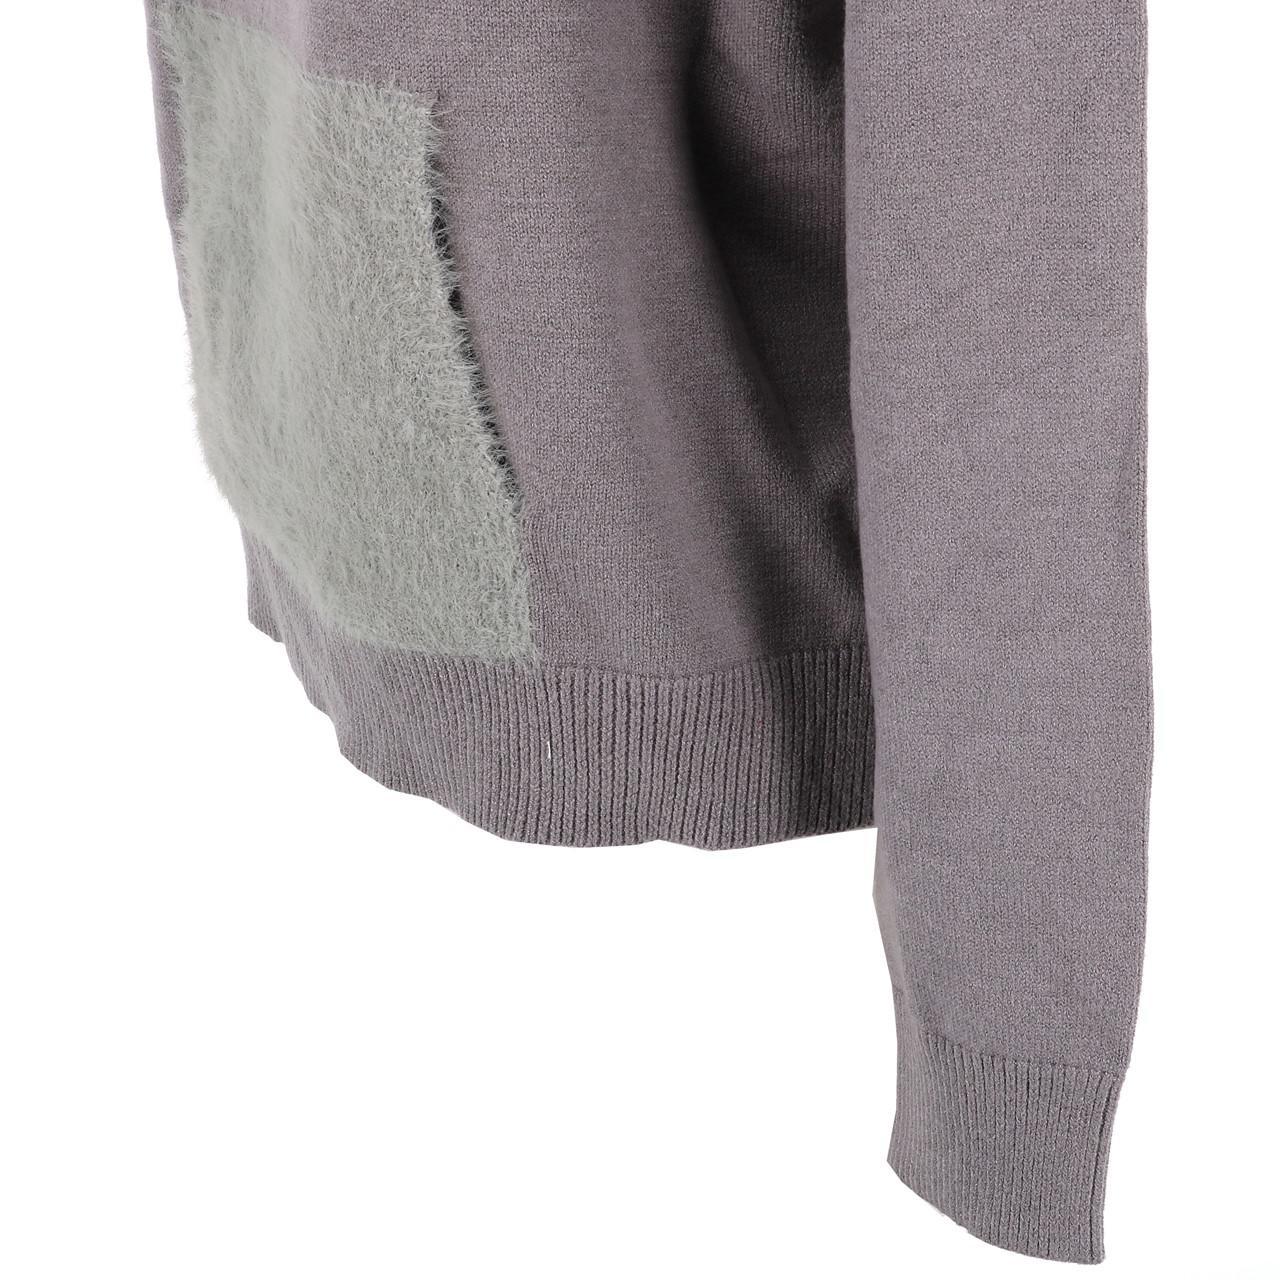 Sweat-Lcouture-Mohair-cap-w-gris-Gris-53717-Neuf miniature 3